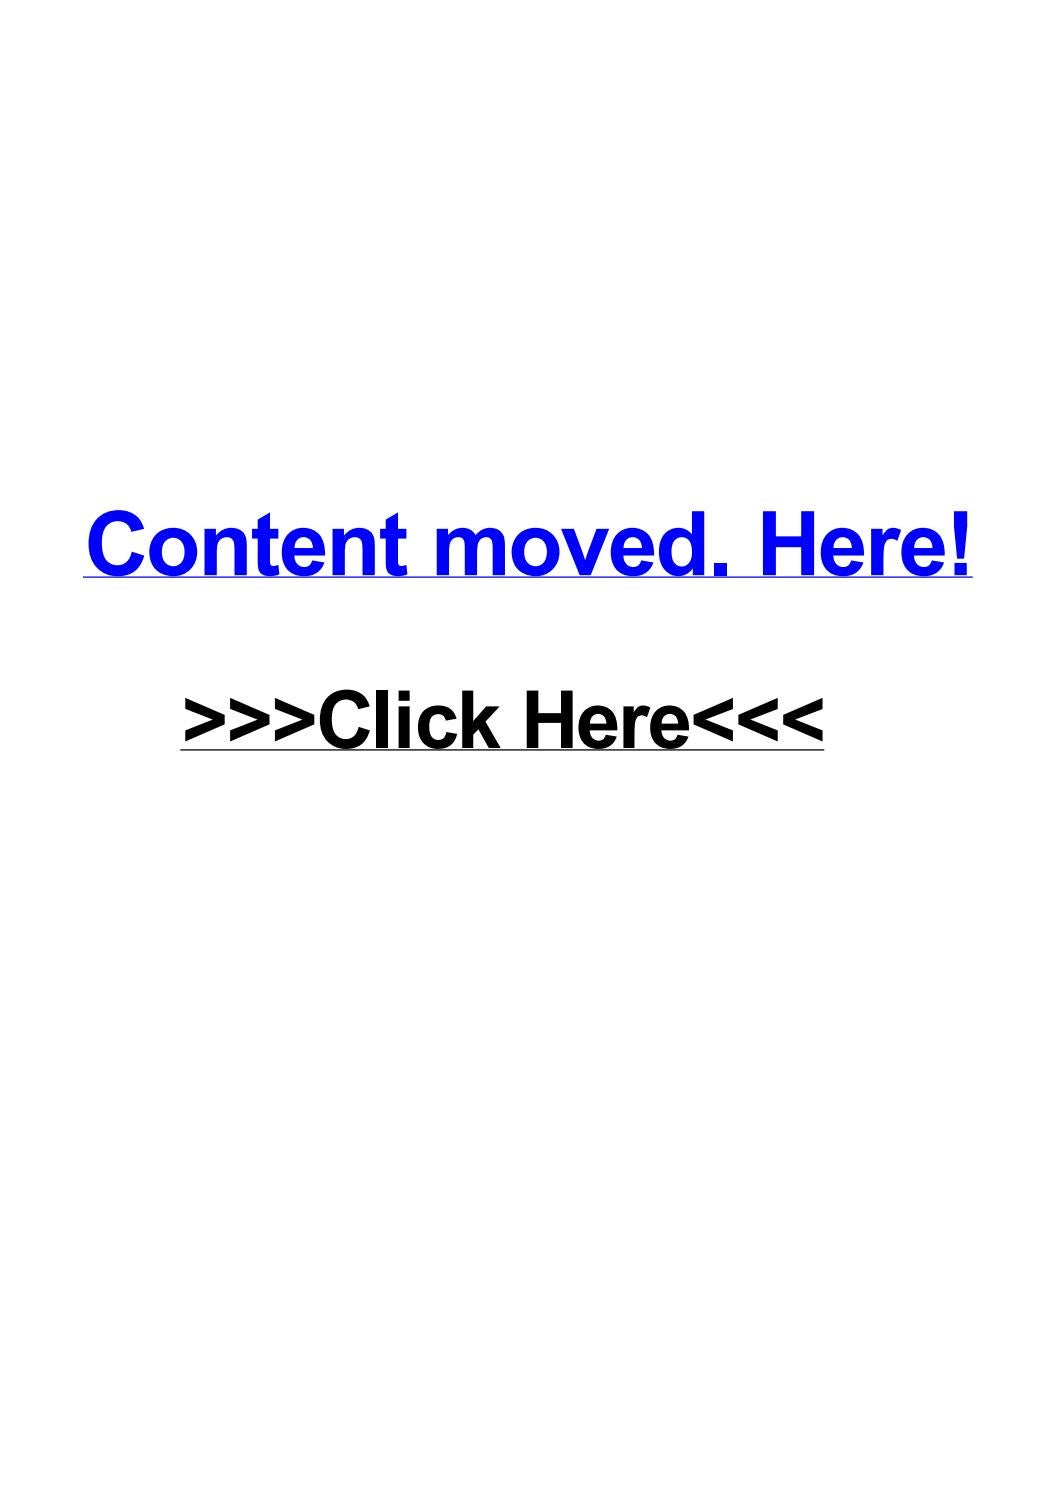 Thesis formatting services australia application